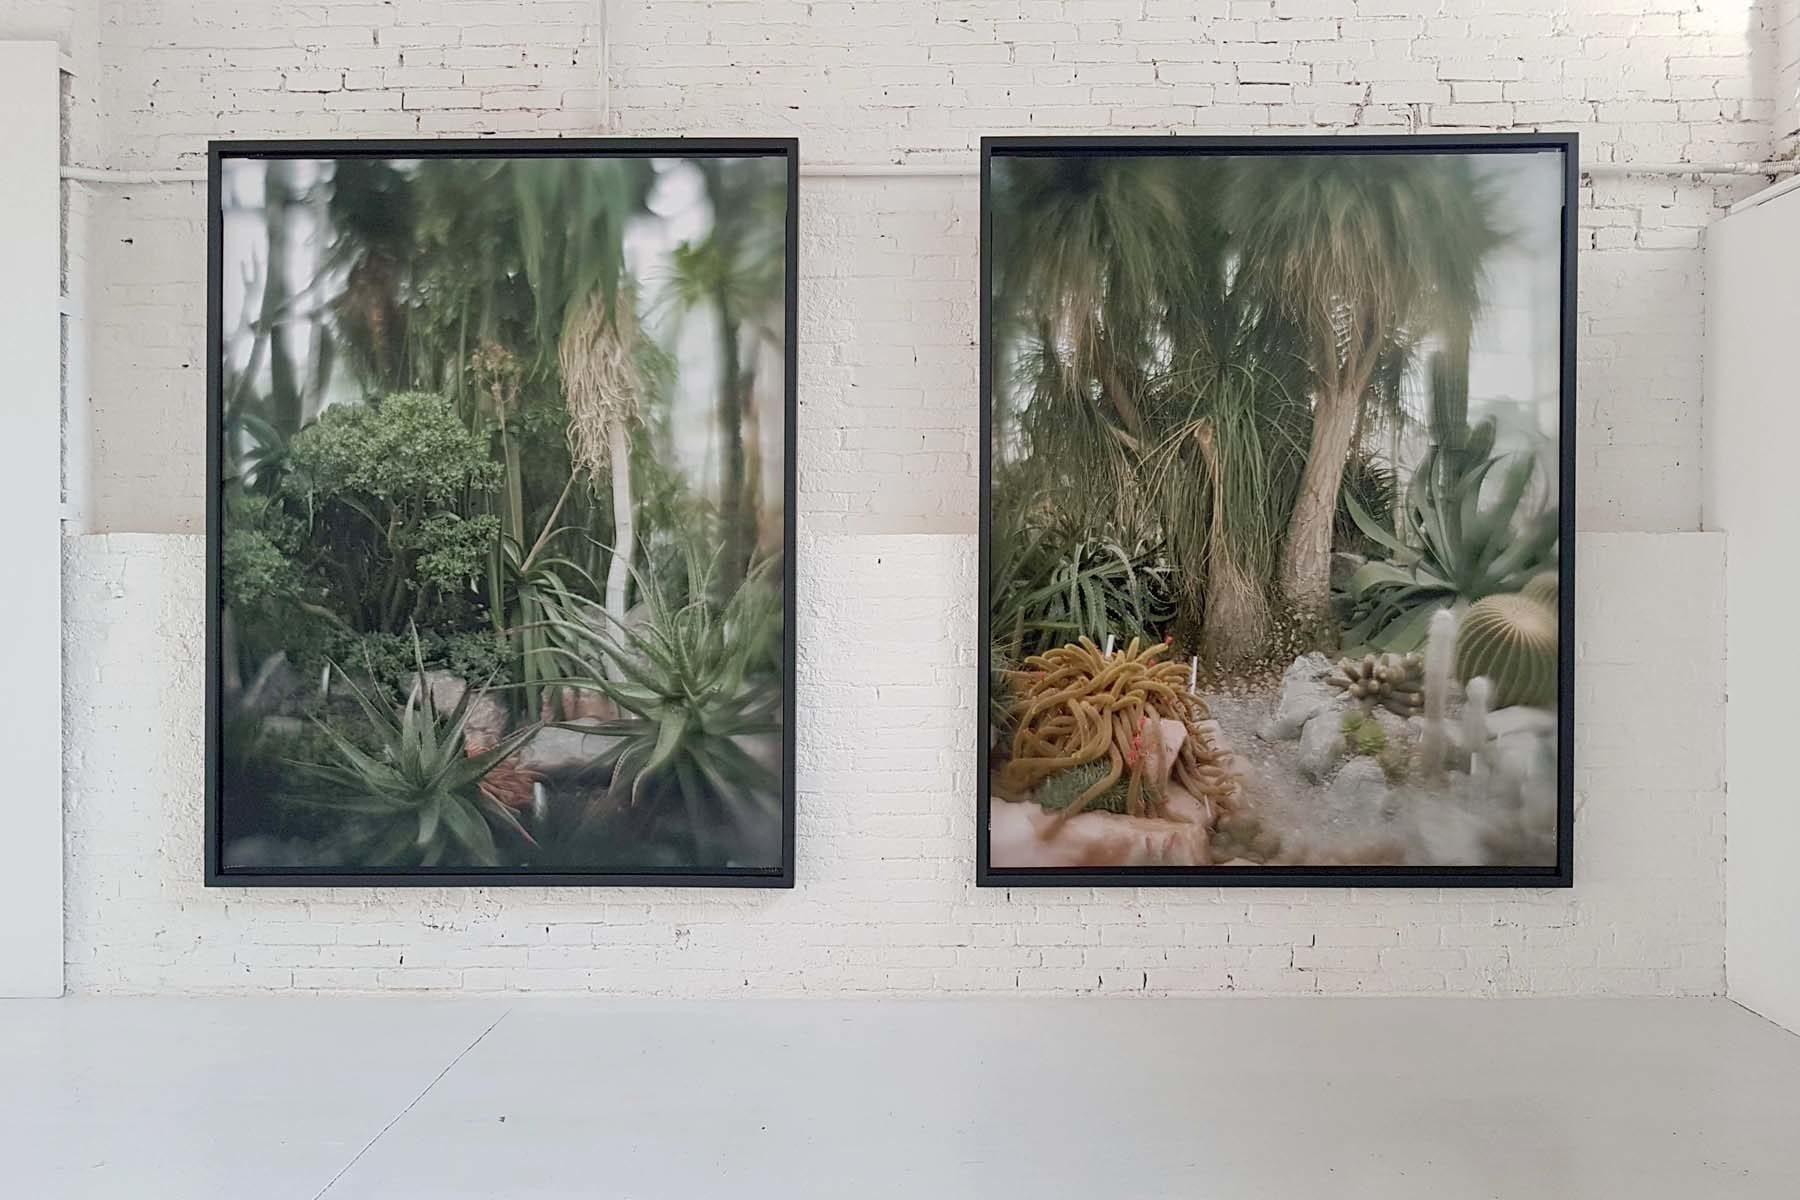 Vincenzo Castella, #04 Zurigo & #09 Zurigo, 2018, c-print, each 225 x 180 cm, ph. M. A. Sereni